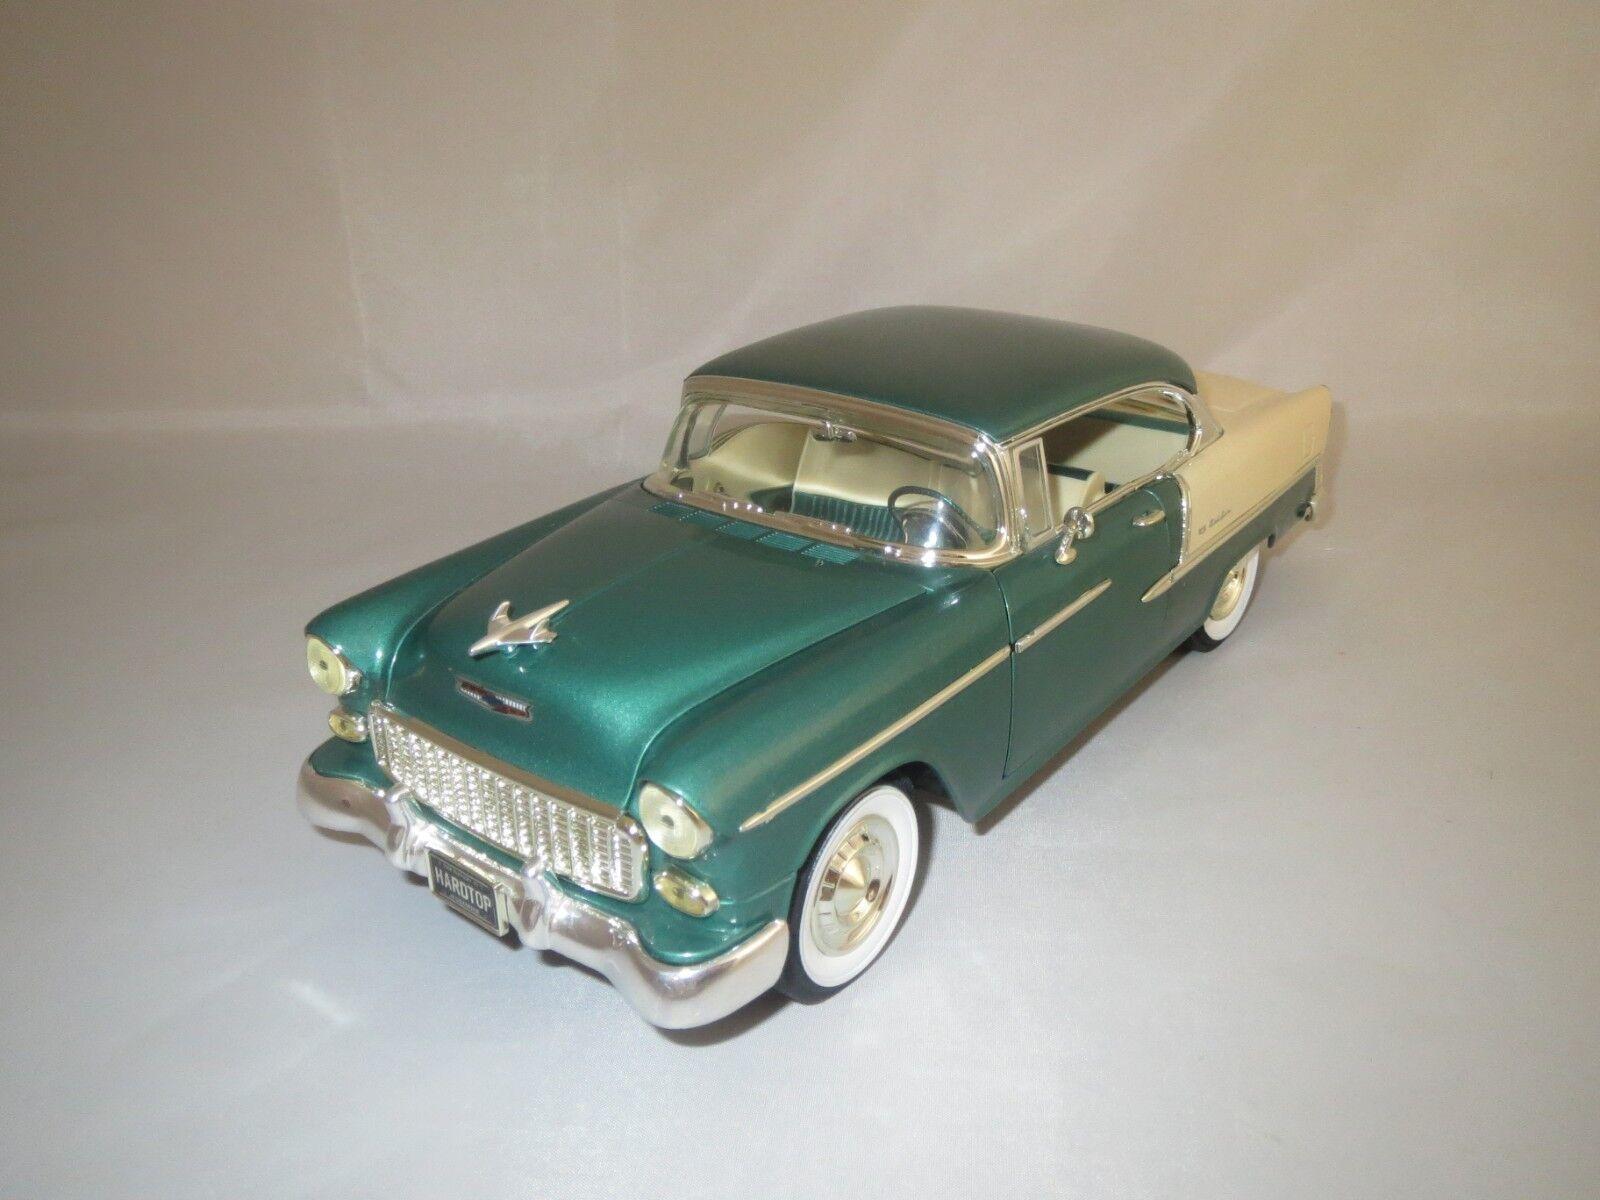 Obtén lo ultimo Ertl American muscle Chevrolet Bel Air  1955  (verde-met.) (verde-met.) (verde-met.) 1 18 sin embalaje   oferta especial